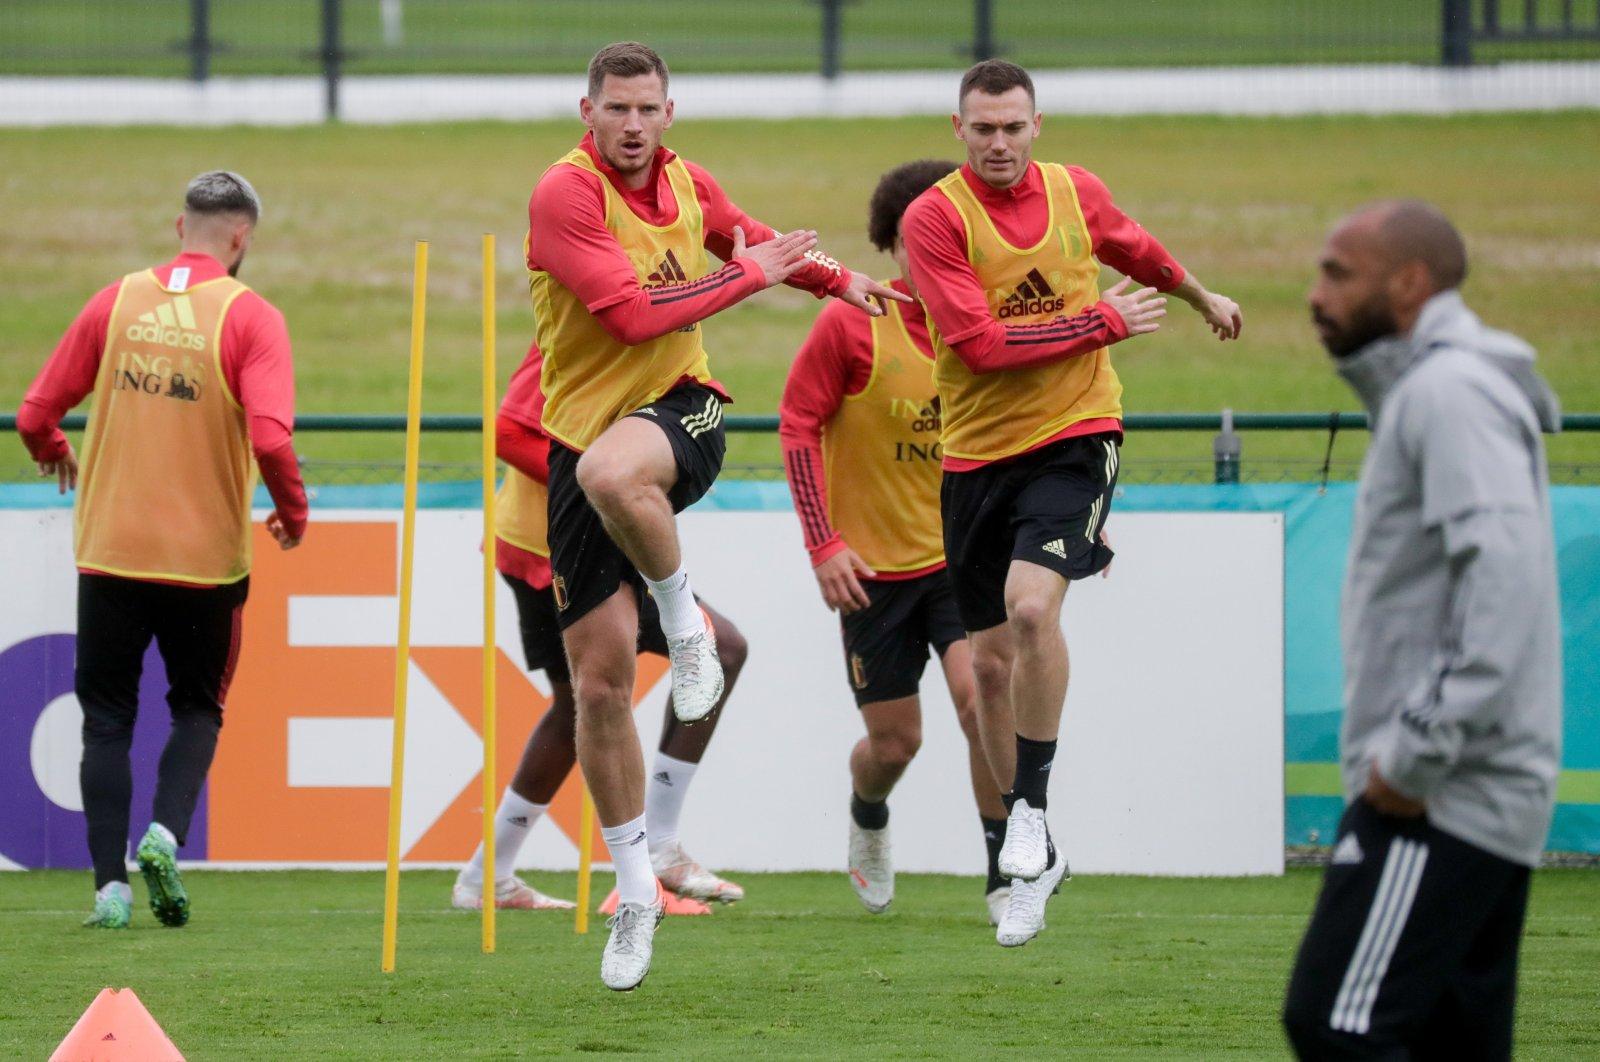 Belgium defenders Jan Vertonghen (L) and Thomas Vermaelen attend a training session in Tubize, Belgium, June 30, 2021. (EPA Photo)